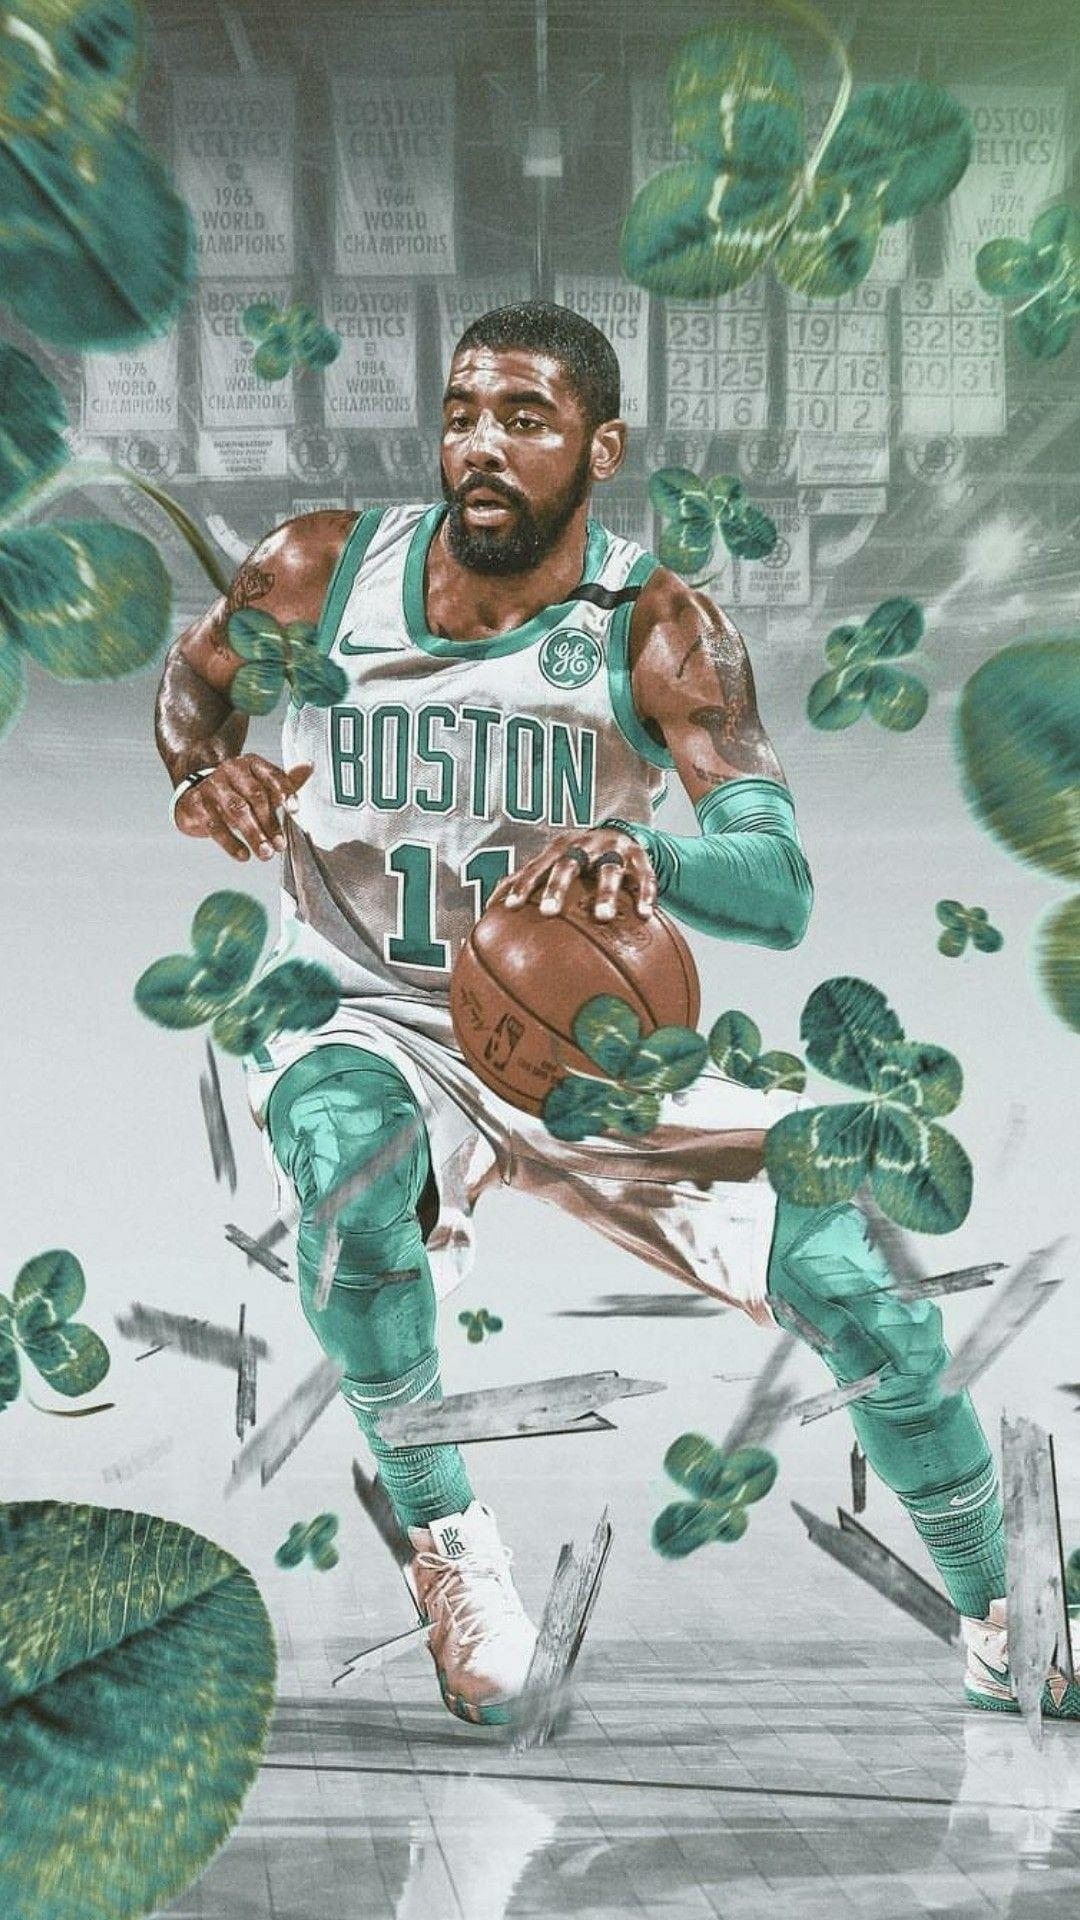 Kyrie Irving Boston Celtics Wallpapers - Wallpaper CaveKyrie Irving Wallpaper